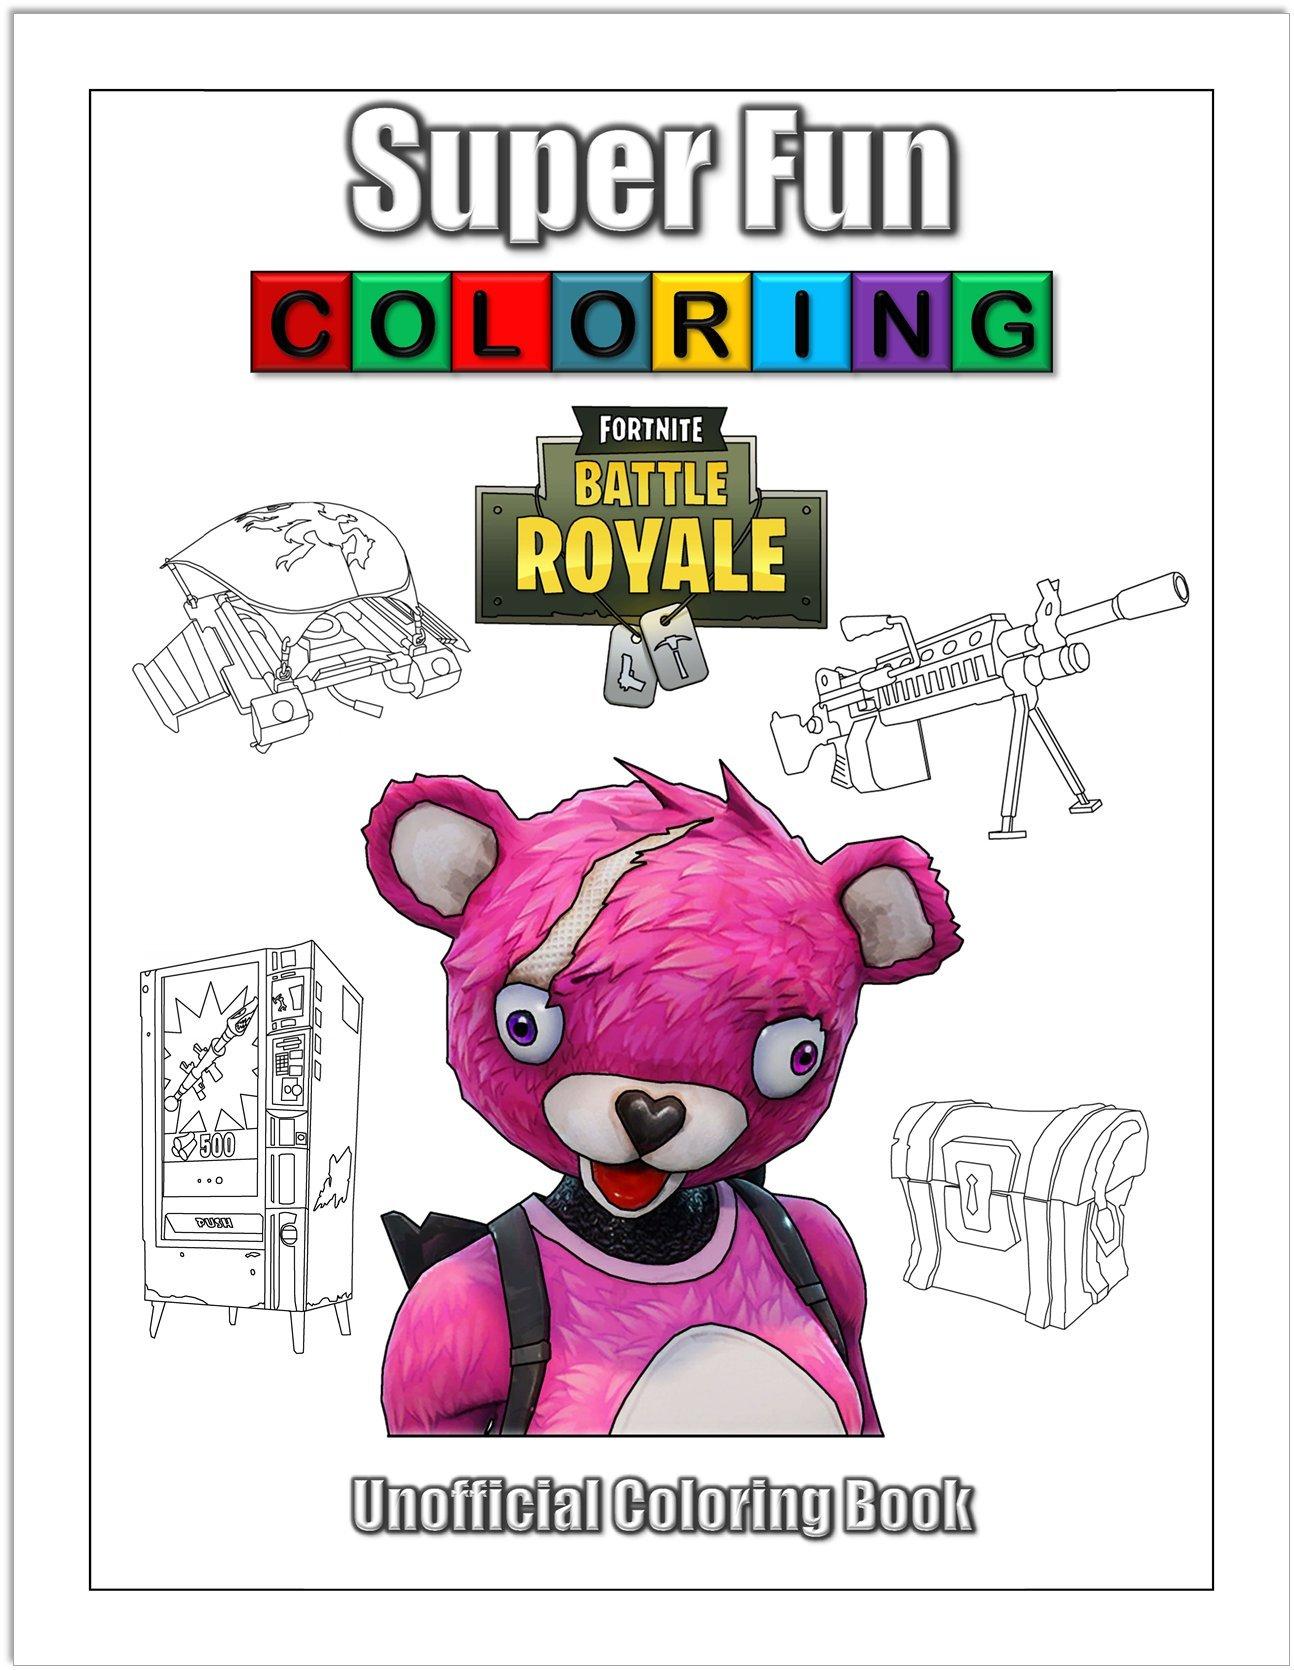 Super Fun Coloring Unofficial Fortnite Battle Royale Coloring Book